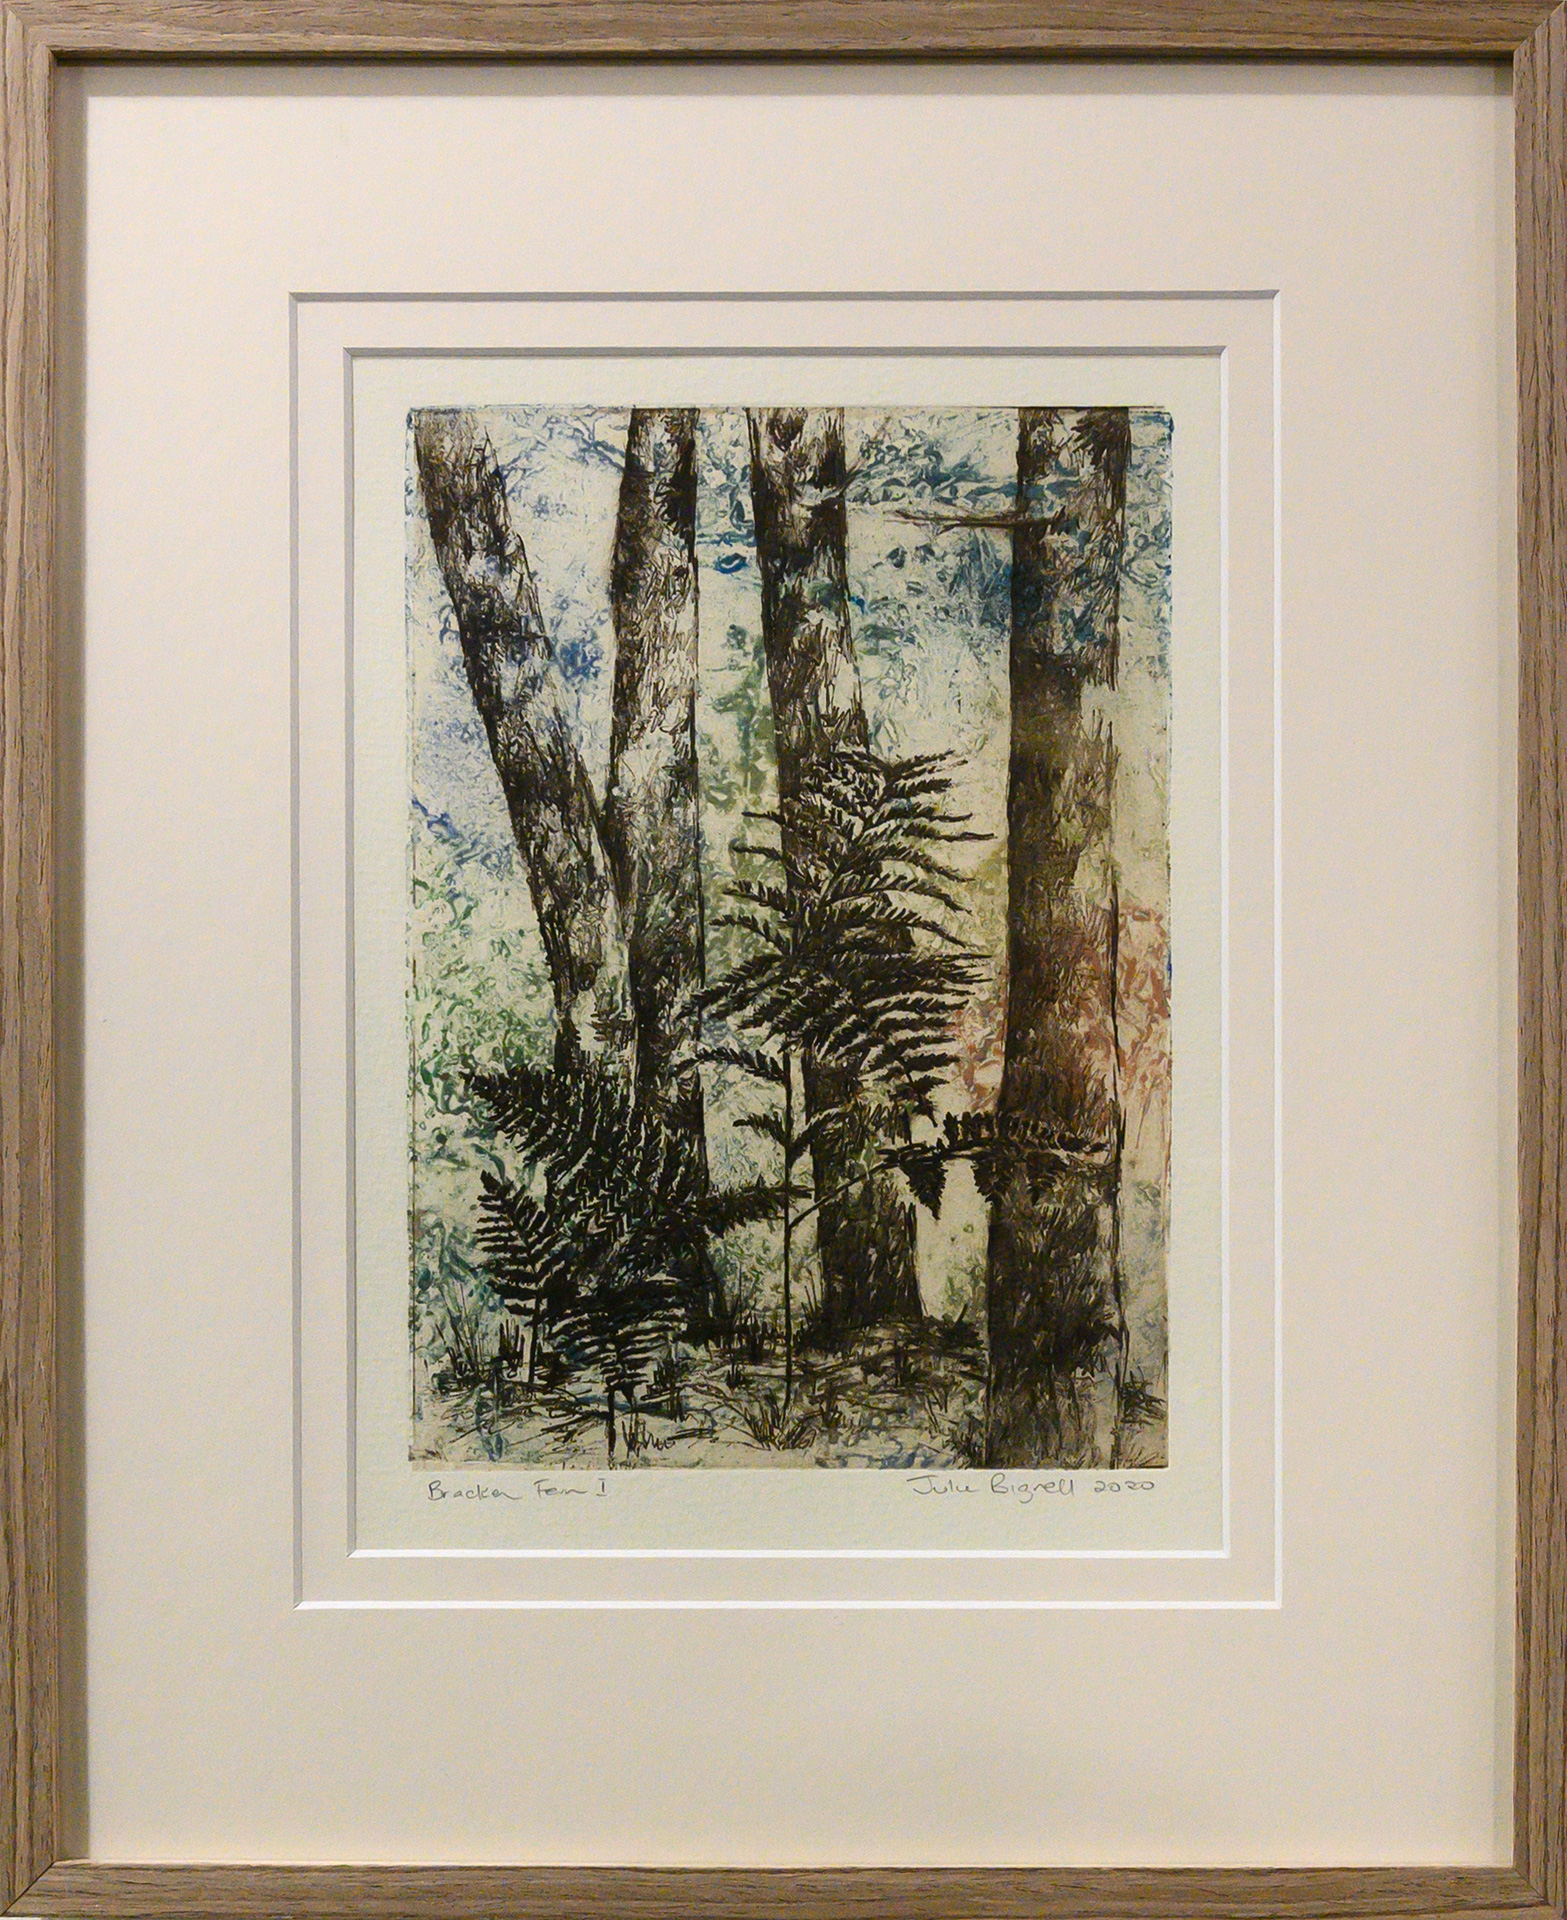 Framed artwork by Julie Bignell of bracken fern amongst tall tree trunks